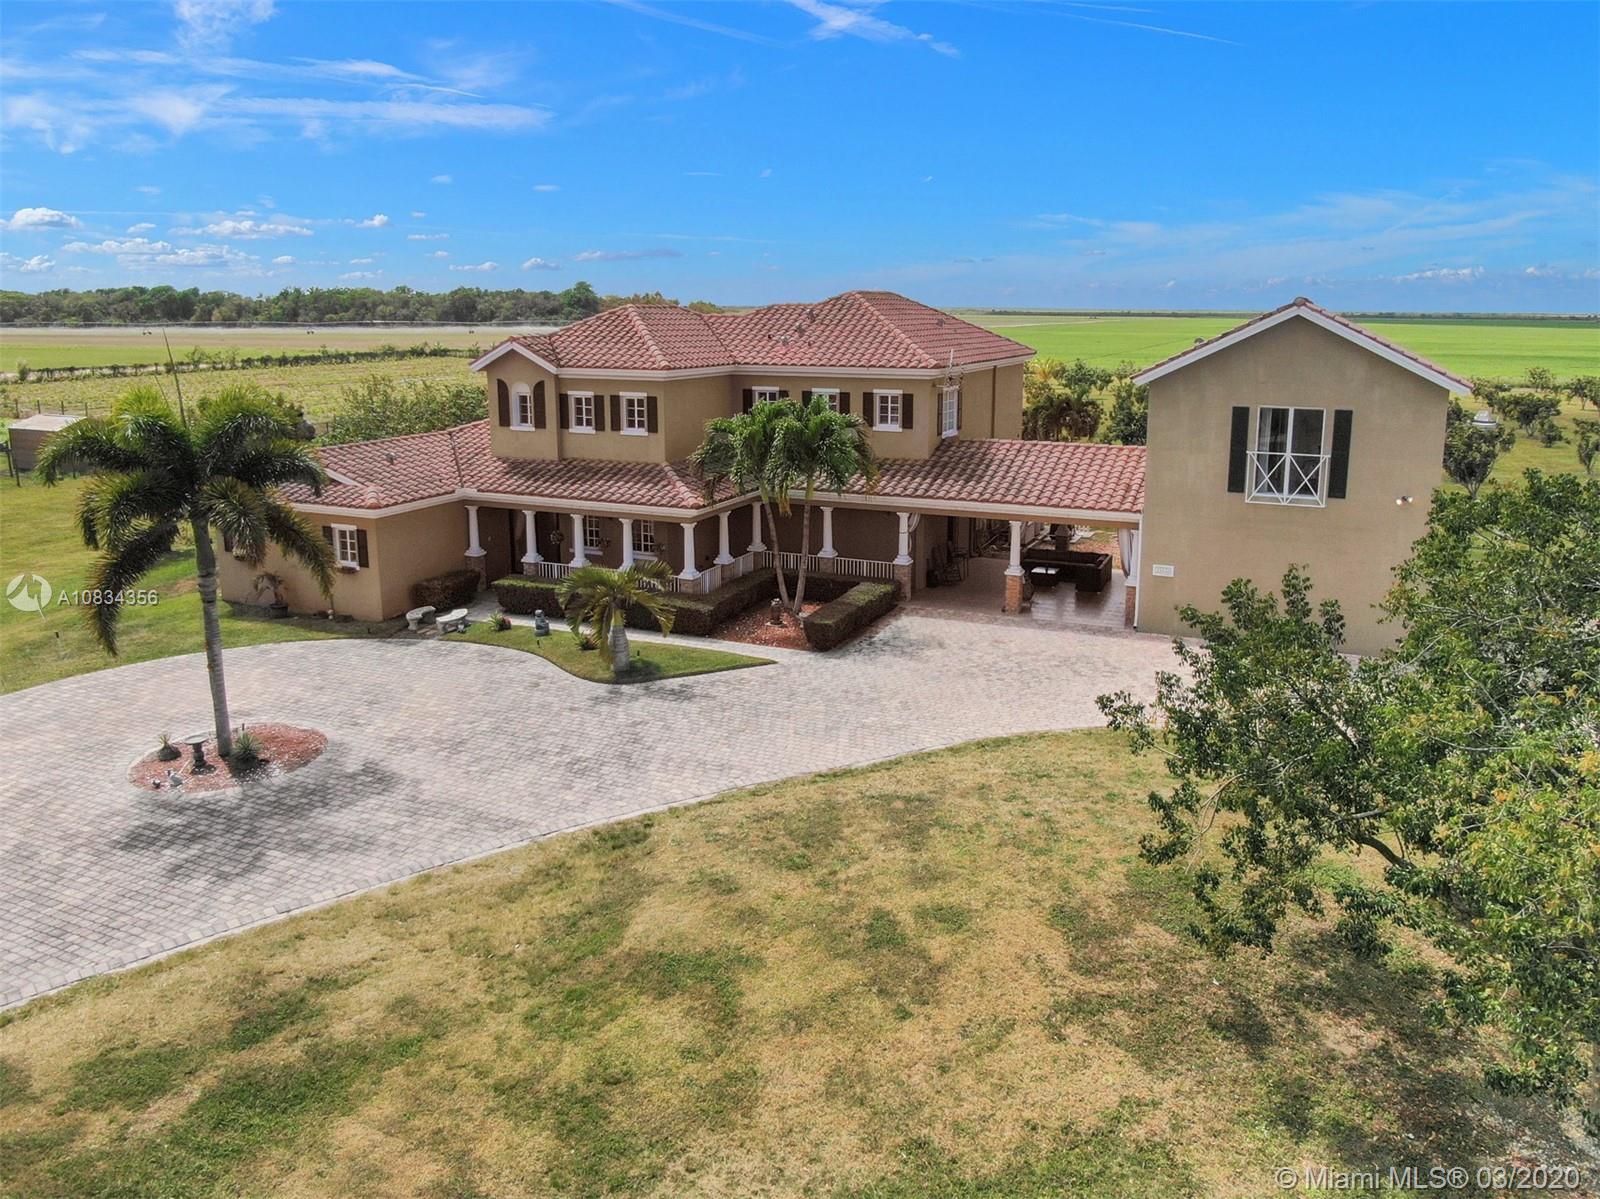 35850 SW 218th Ave, Homestead, FL 33034 - Homestead, FL real estate listing